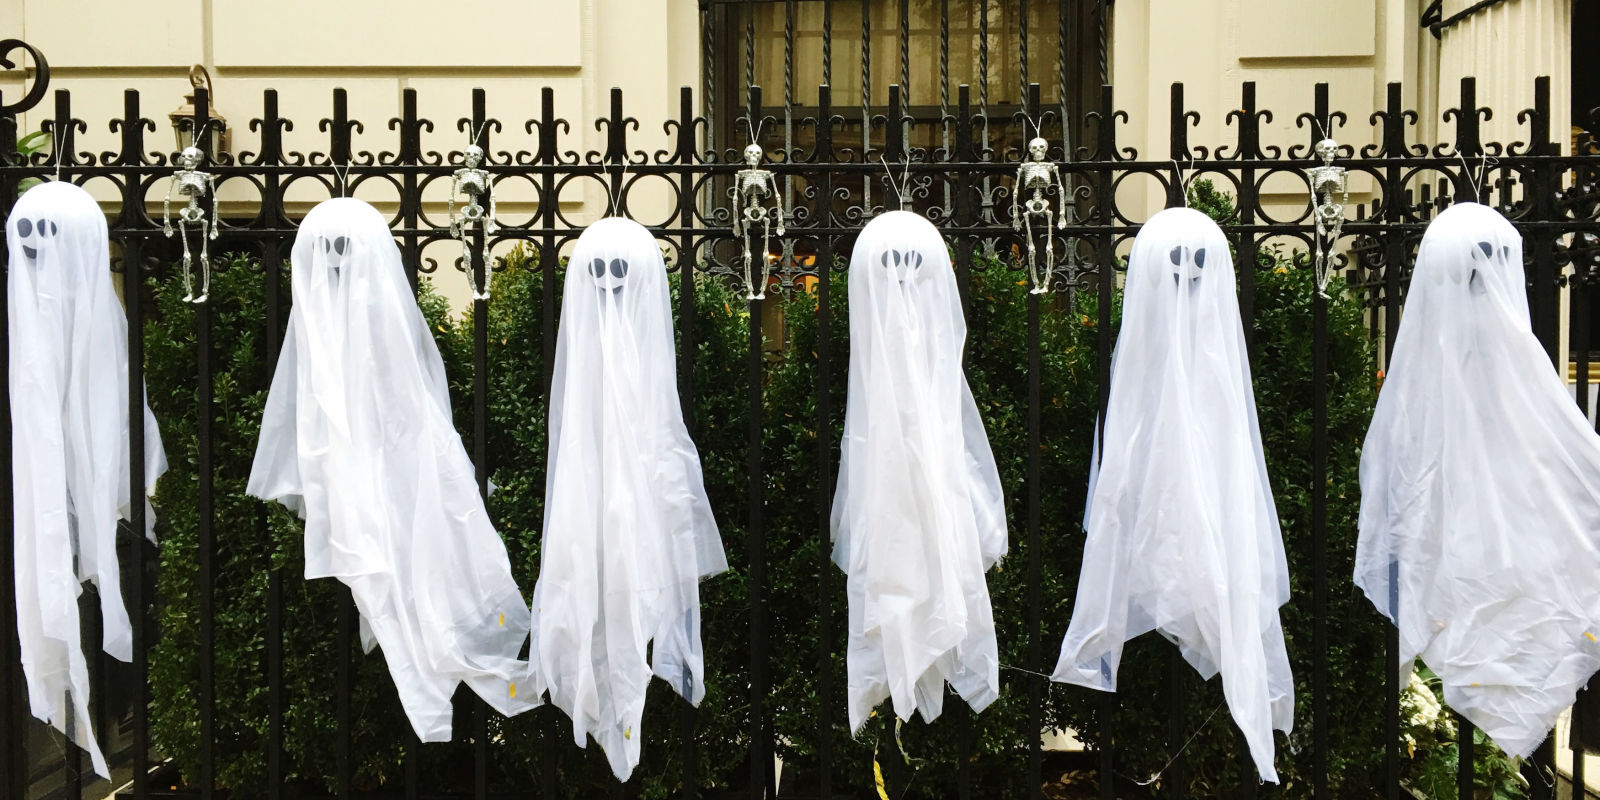 10 best outdoor halloween decorations porch decor ideas - Where can i buy halloween decorations ...